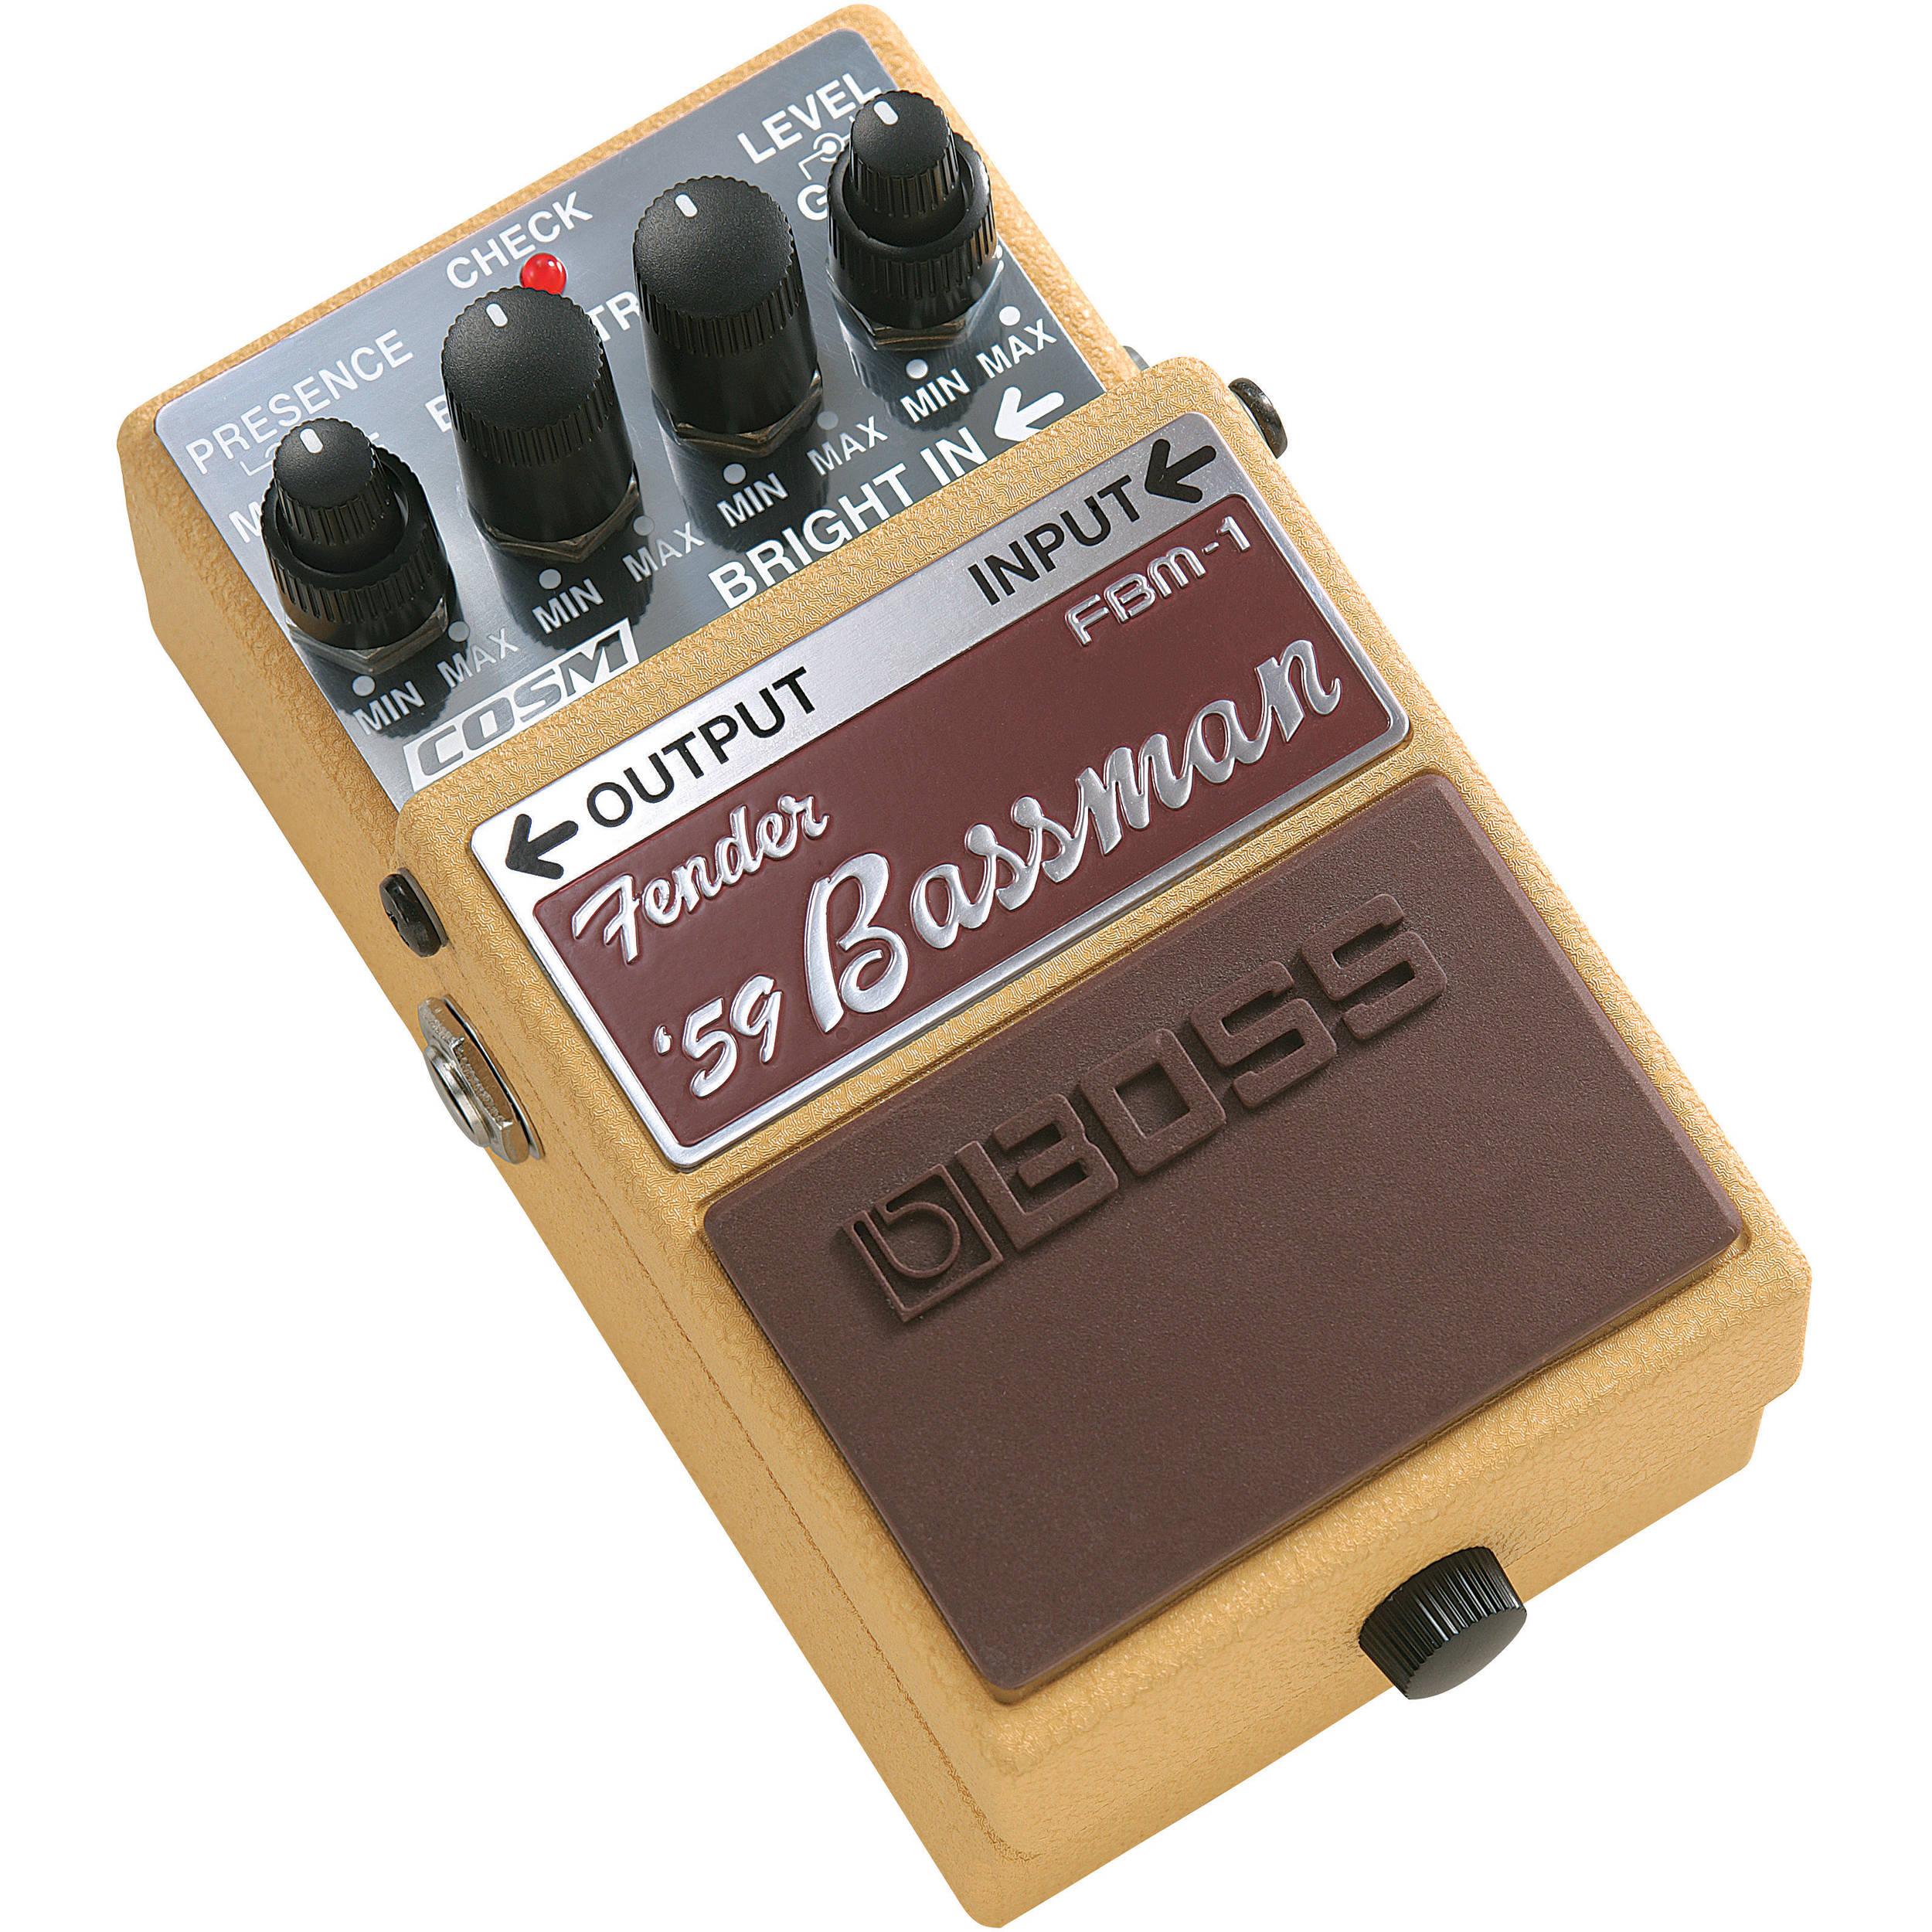 boss fbm 1 fender 39 59 bassman pedal fbm 1 b h photo video. Black Bedroom Furniture Sets. Home Design Ideas